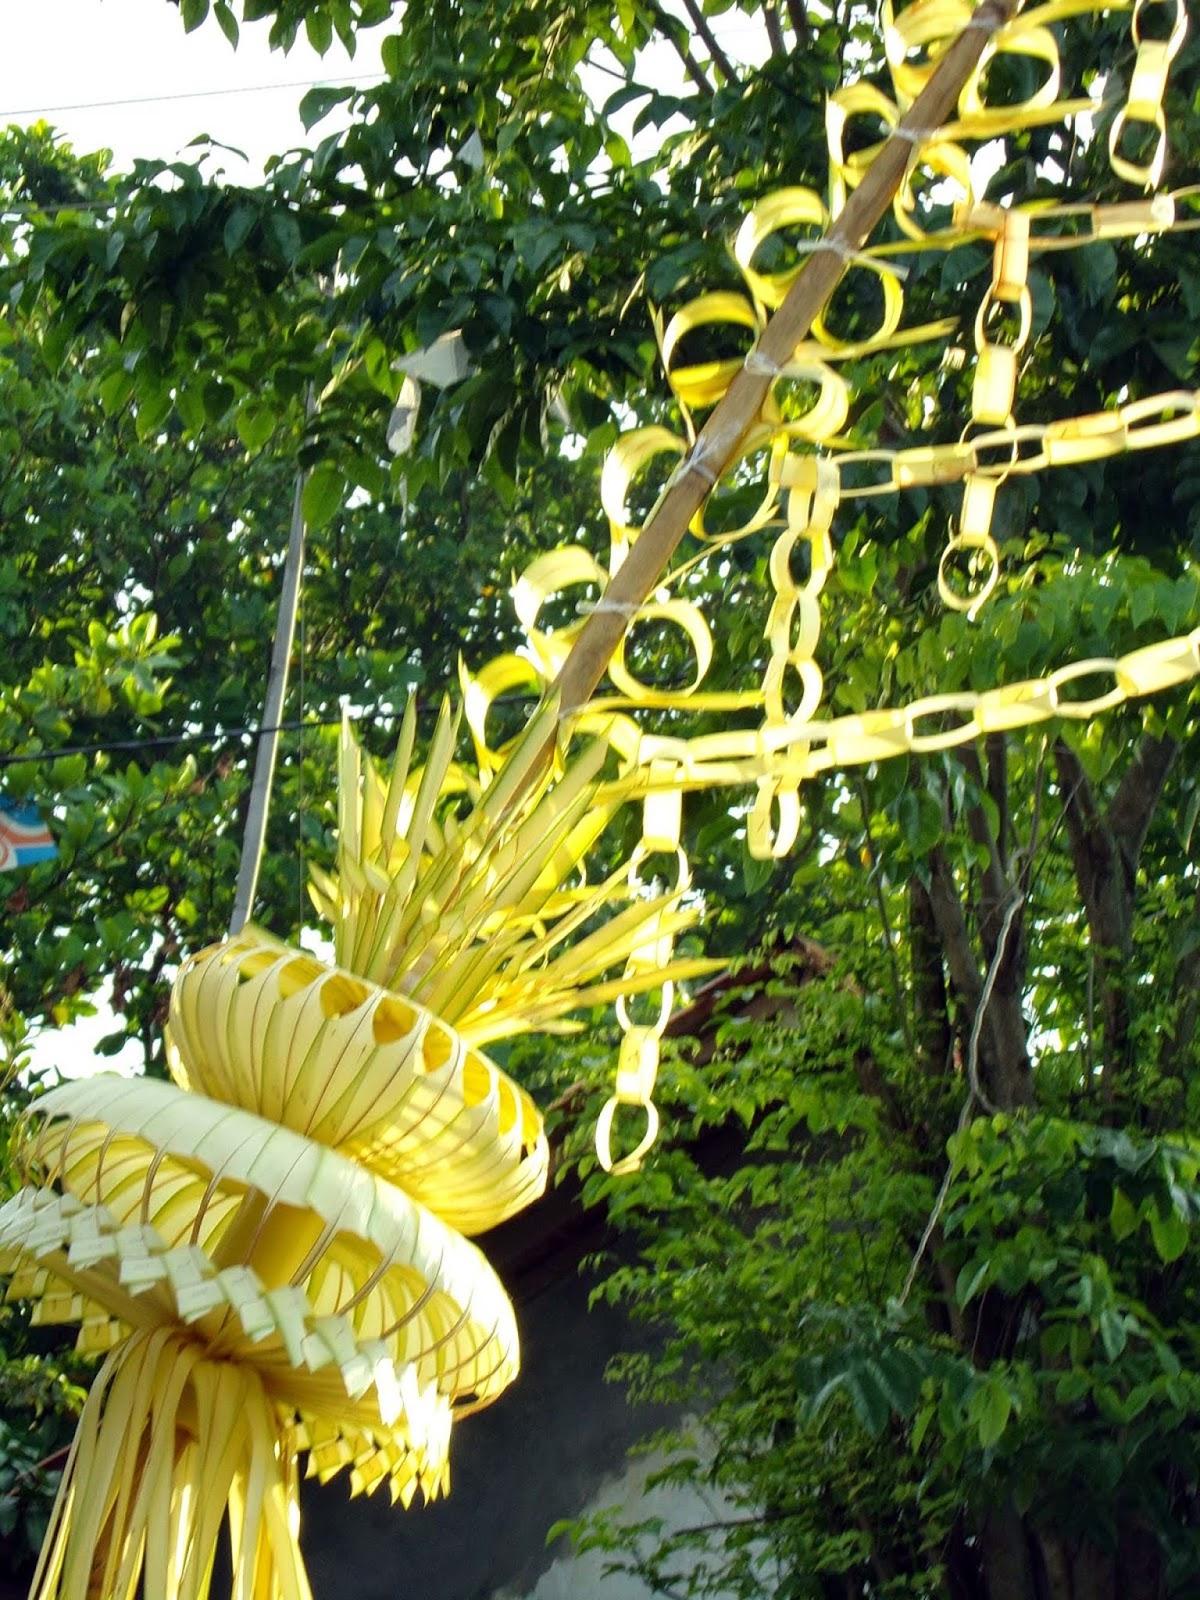 Hiasan Janur Kuning : hiasan, janur, kuning, MUASAL, HIASAN, JANUR, KUNING, ACARA, HAJATAN, Pangandarannews.com